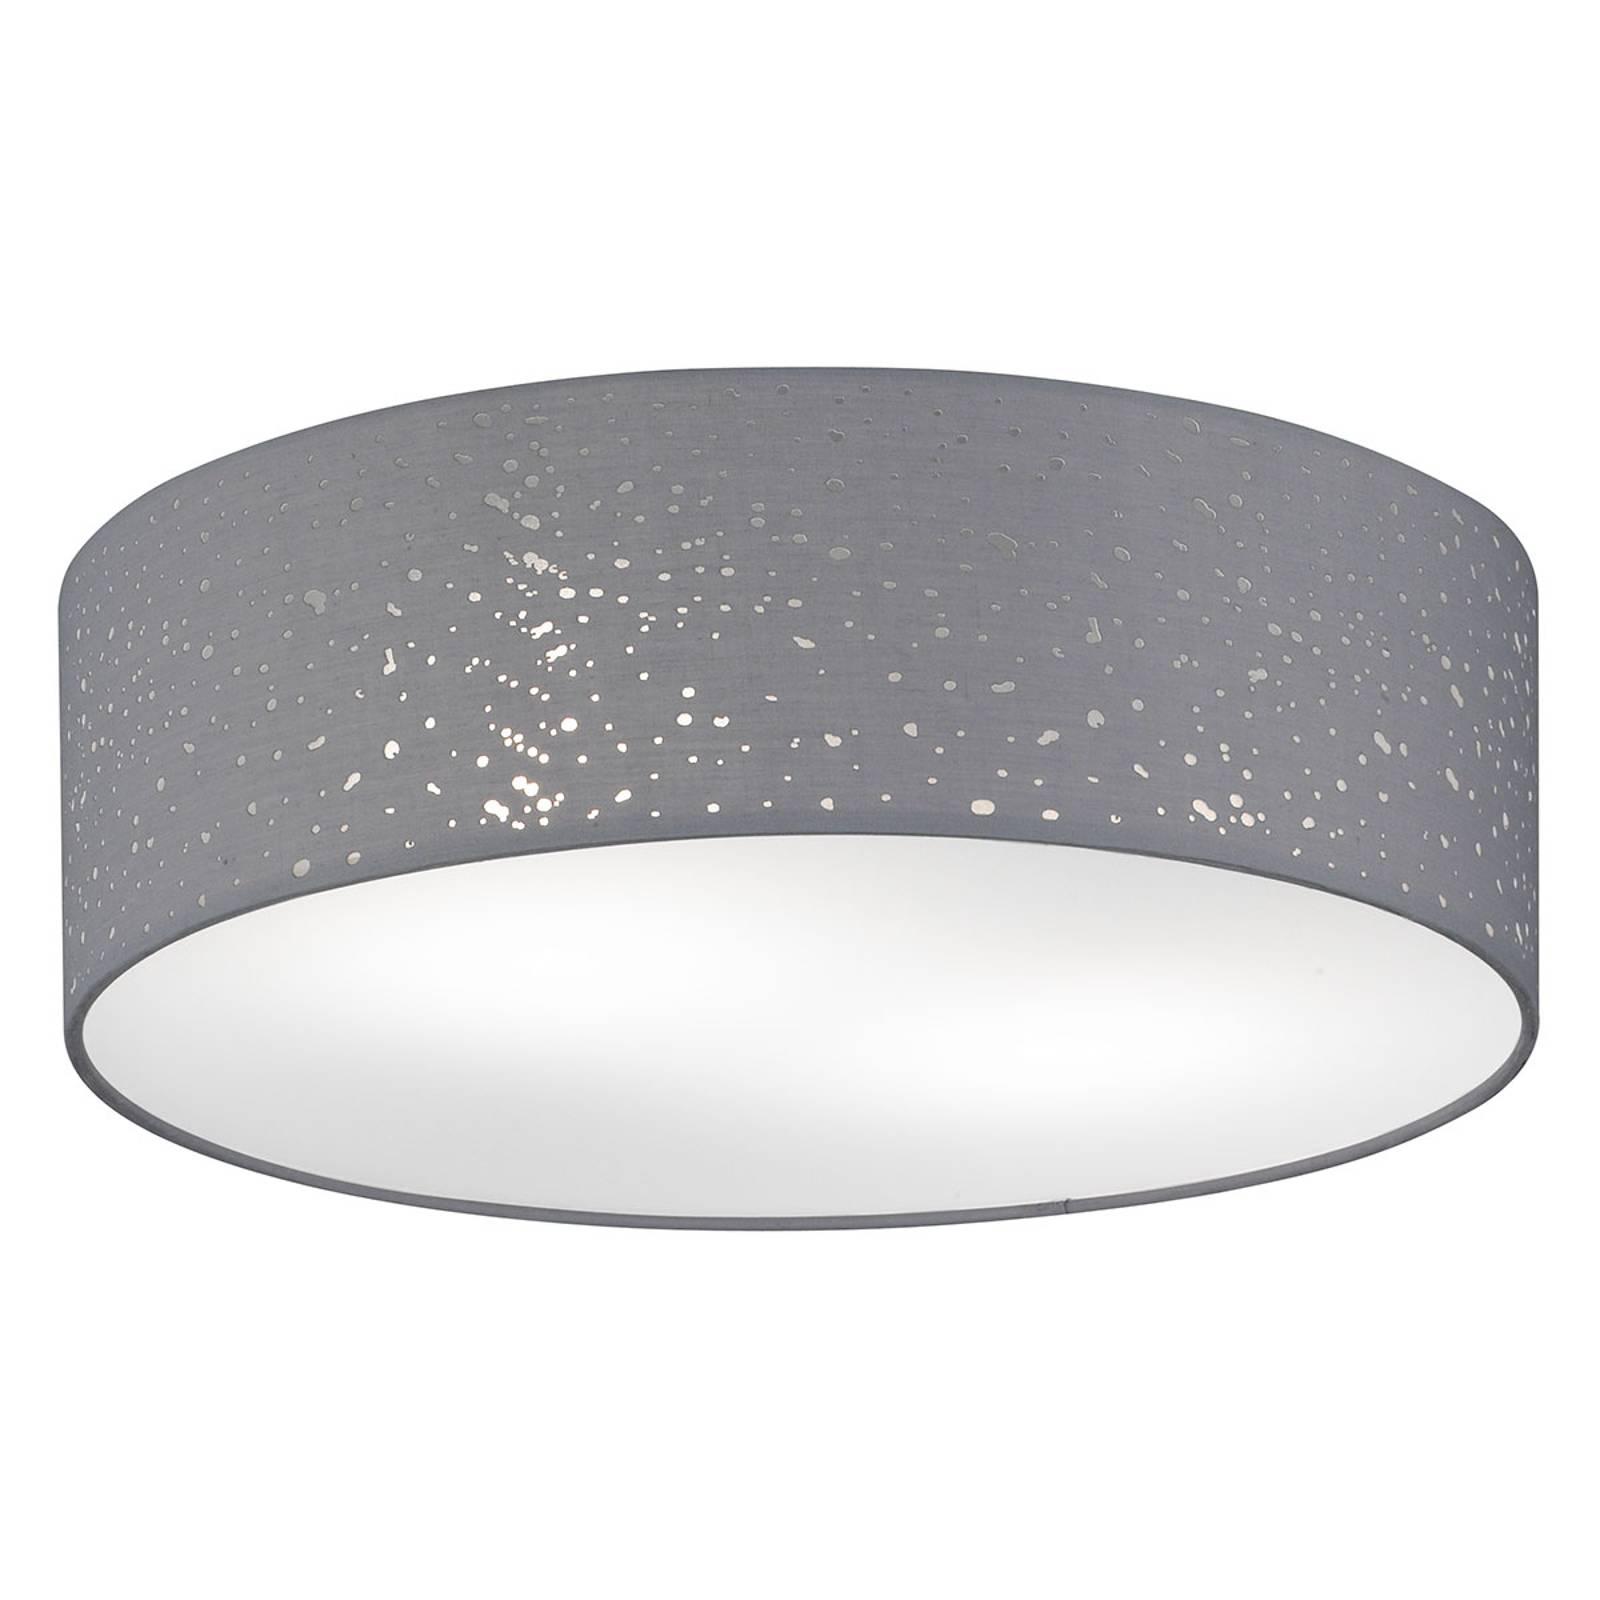 Plafondlamp Thor grijs